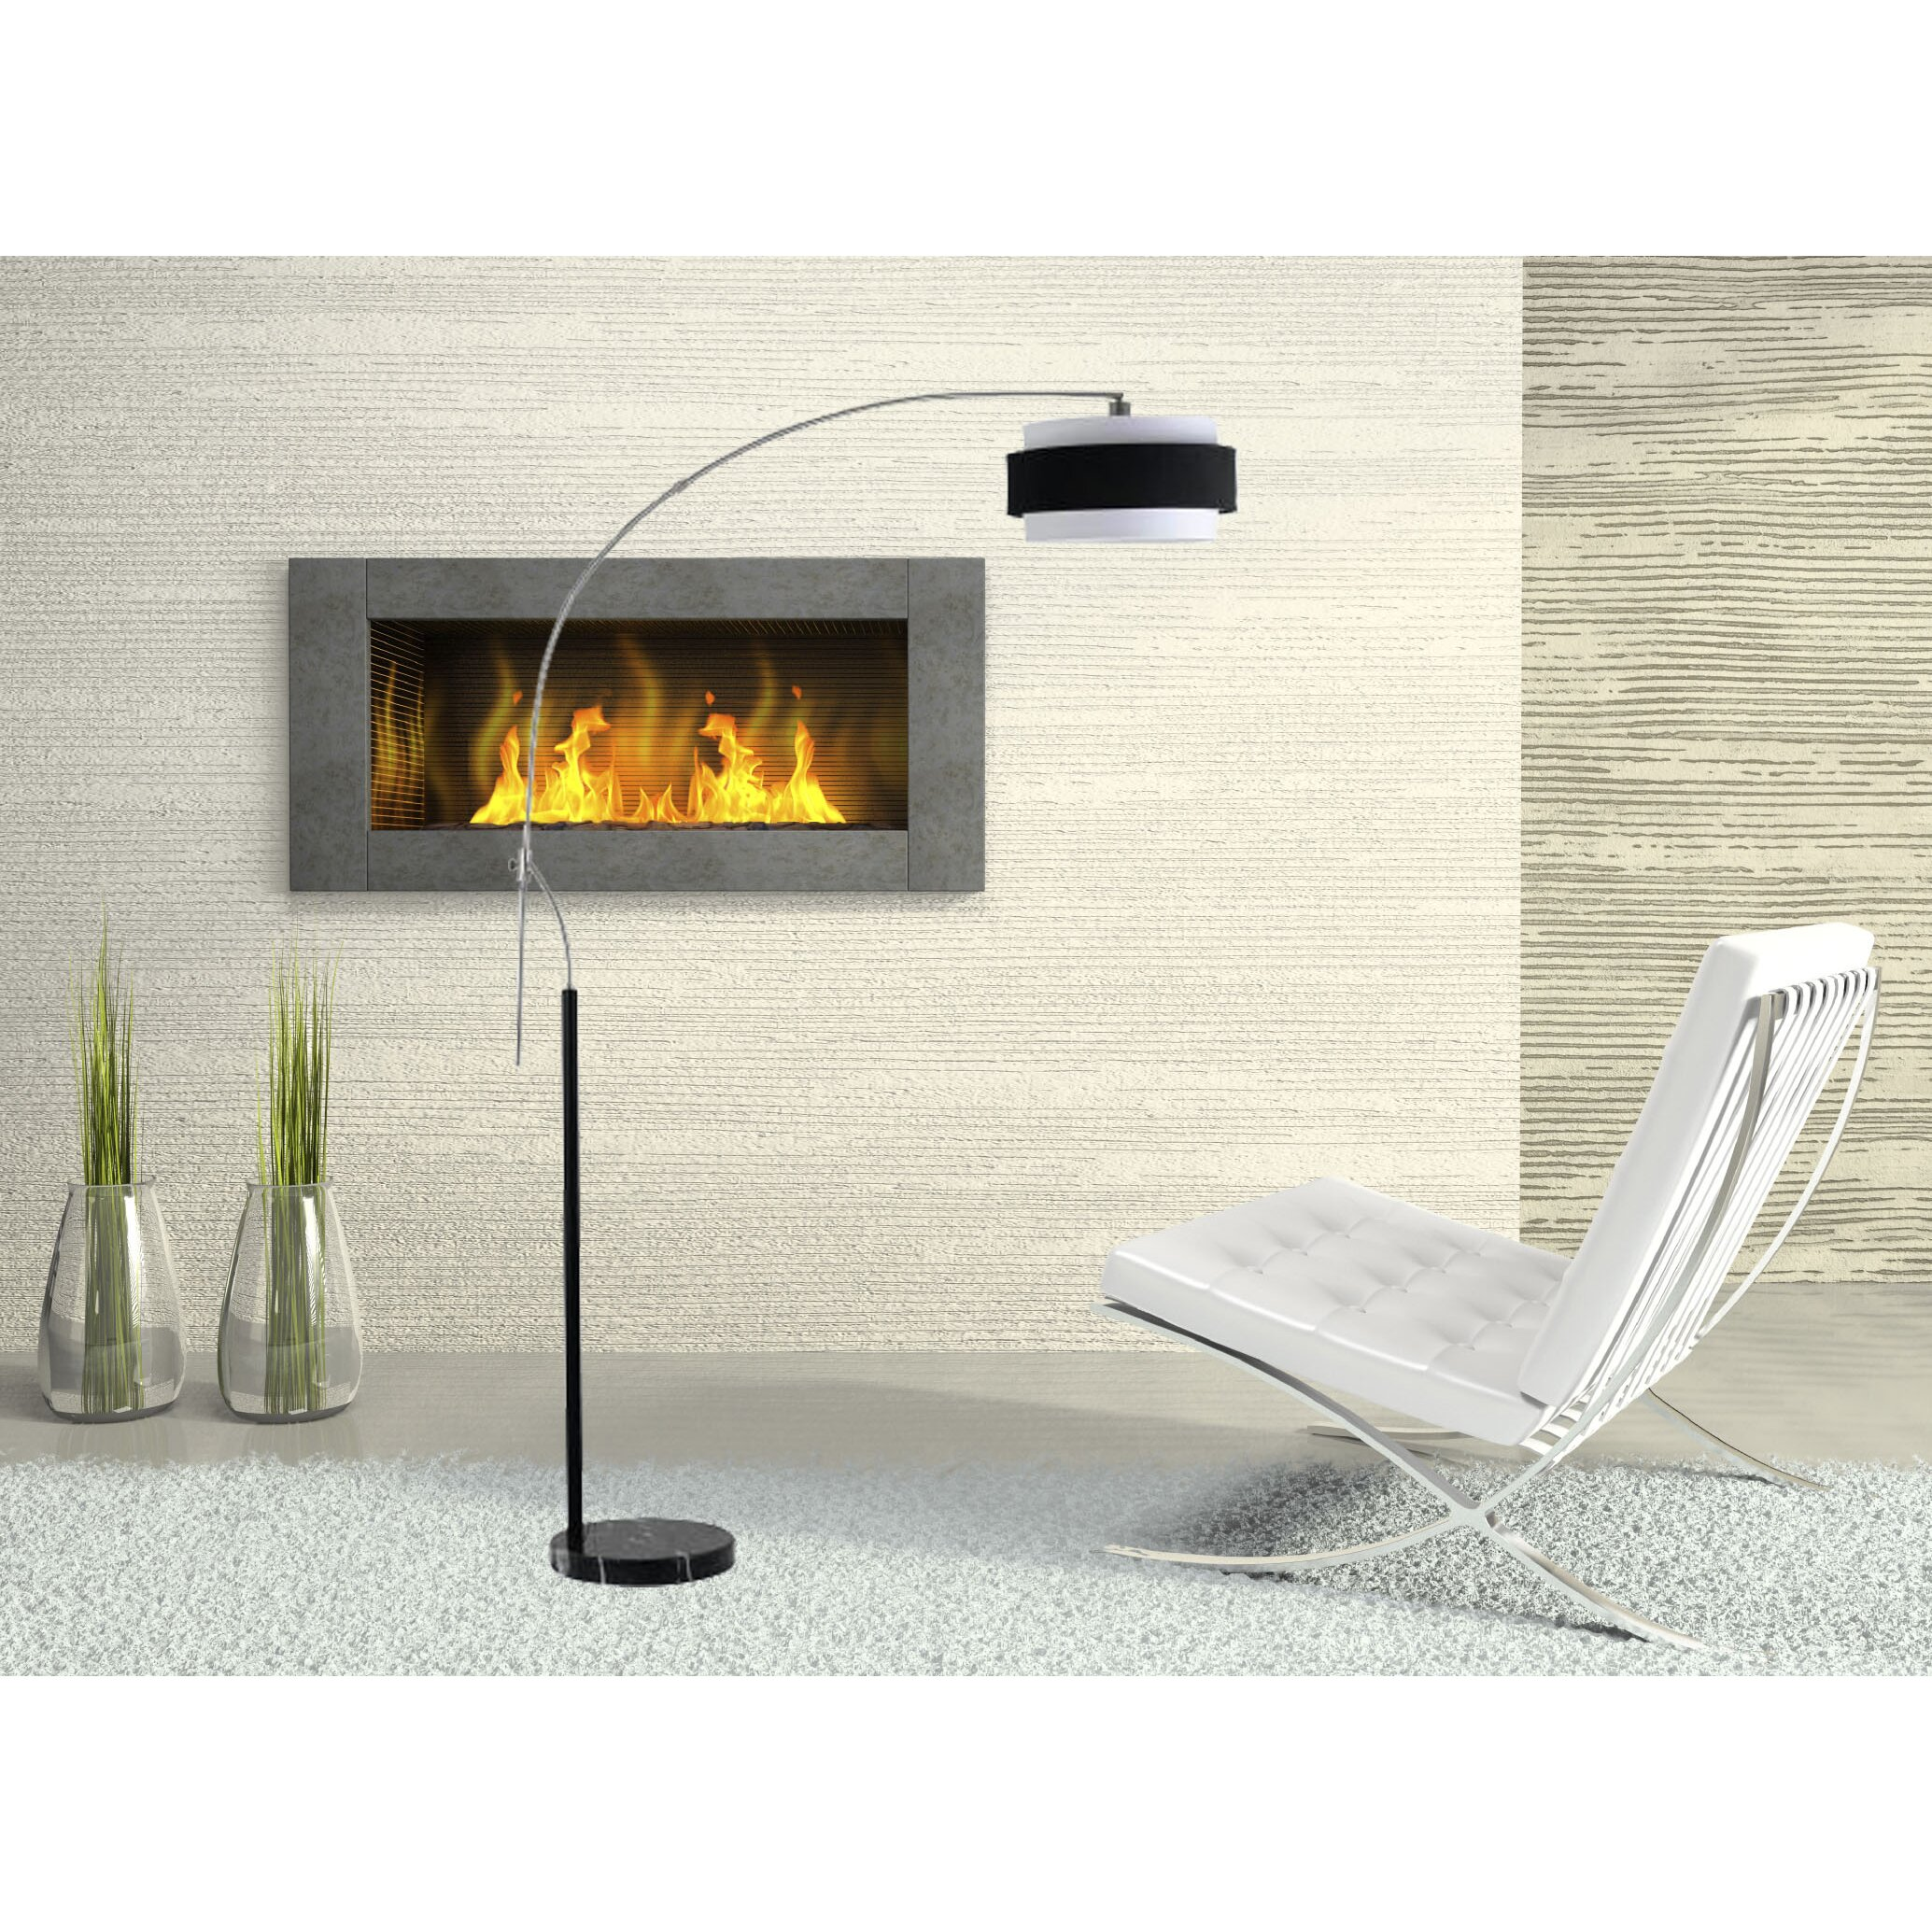 Cal Lighting Santa Monica 95 Arched Floor Lamp Reviews